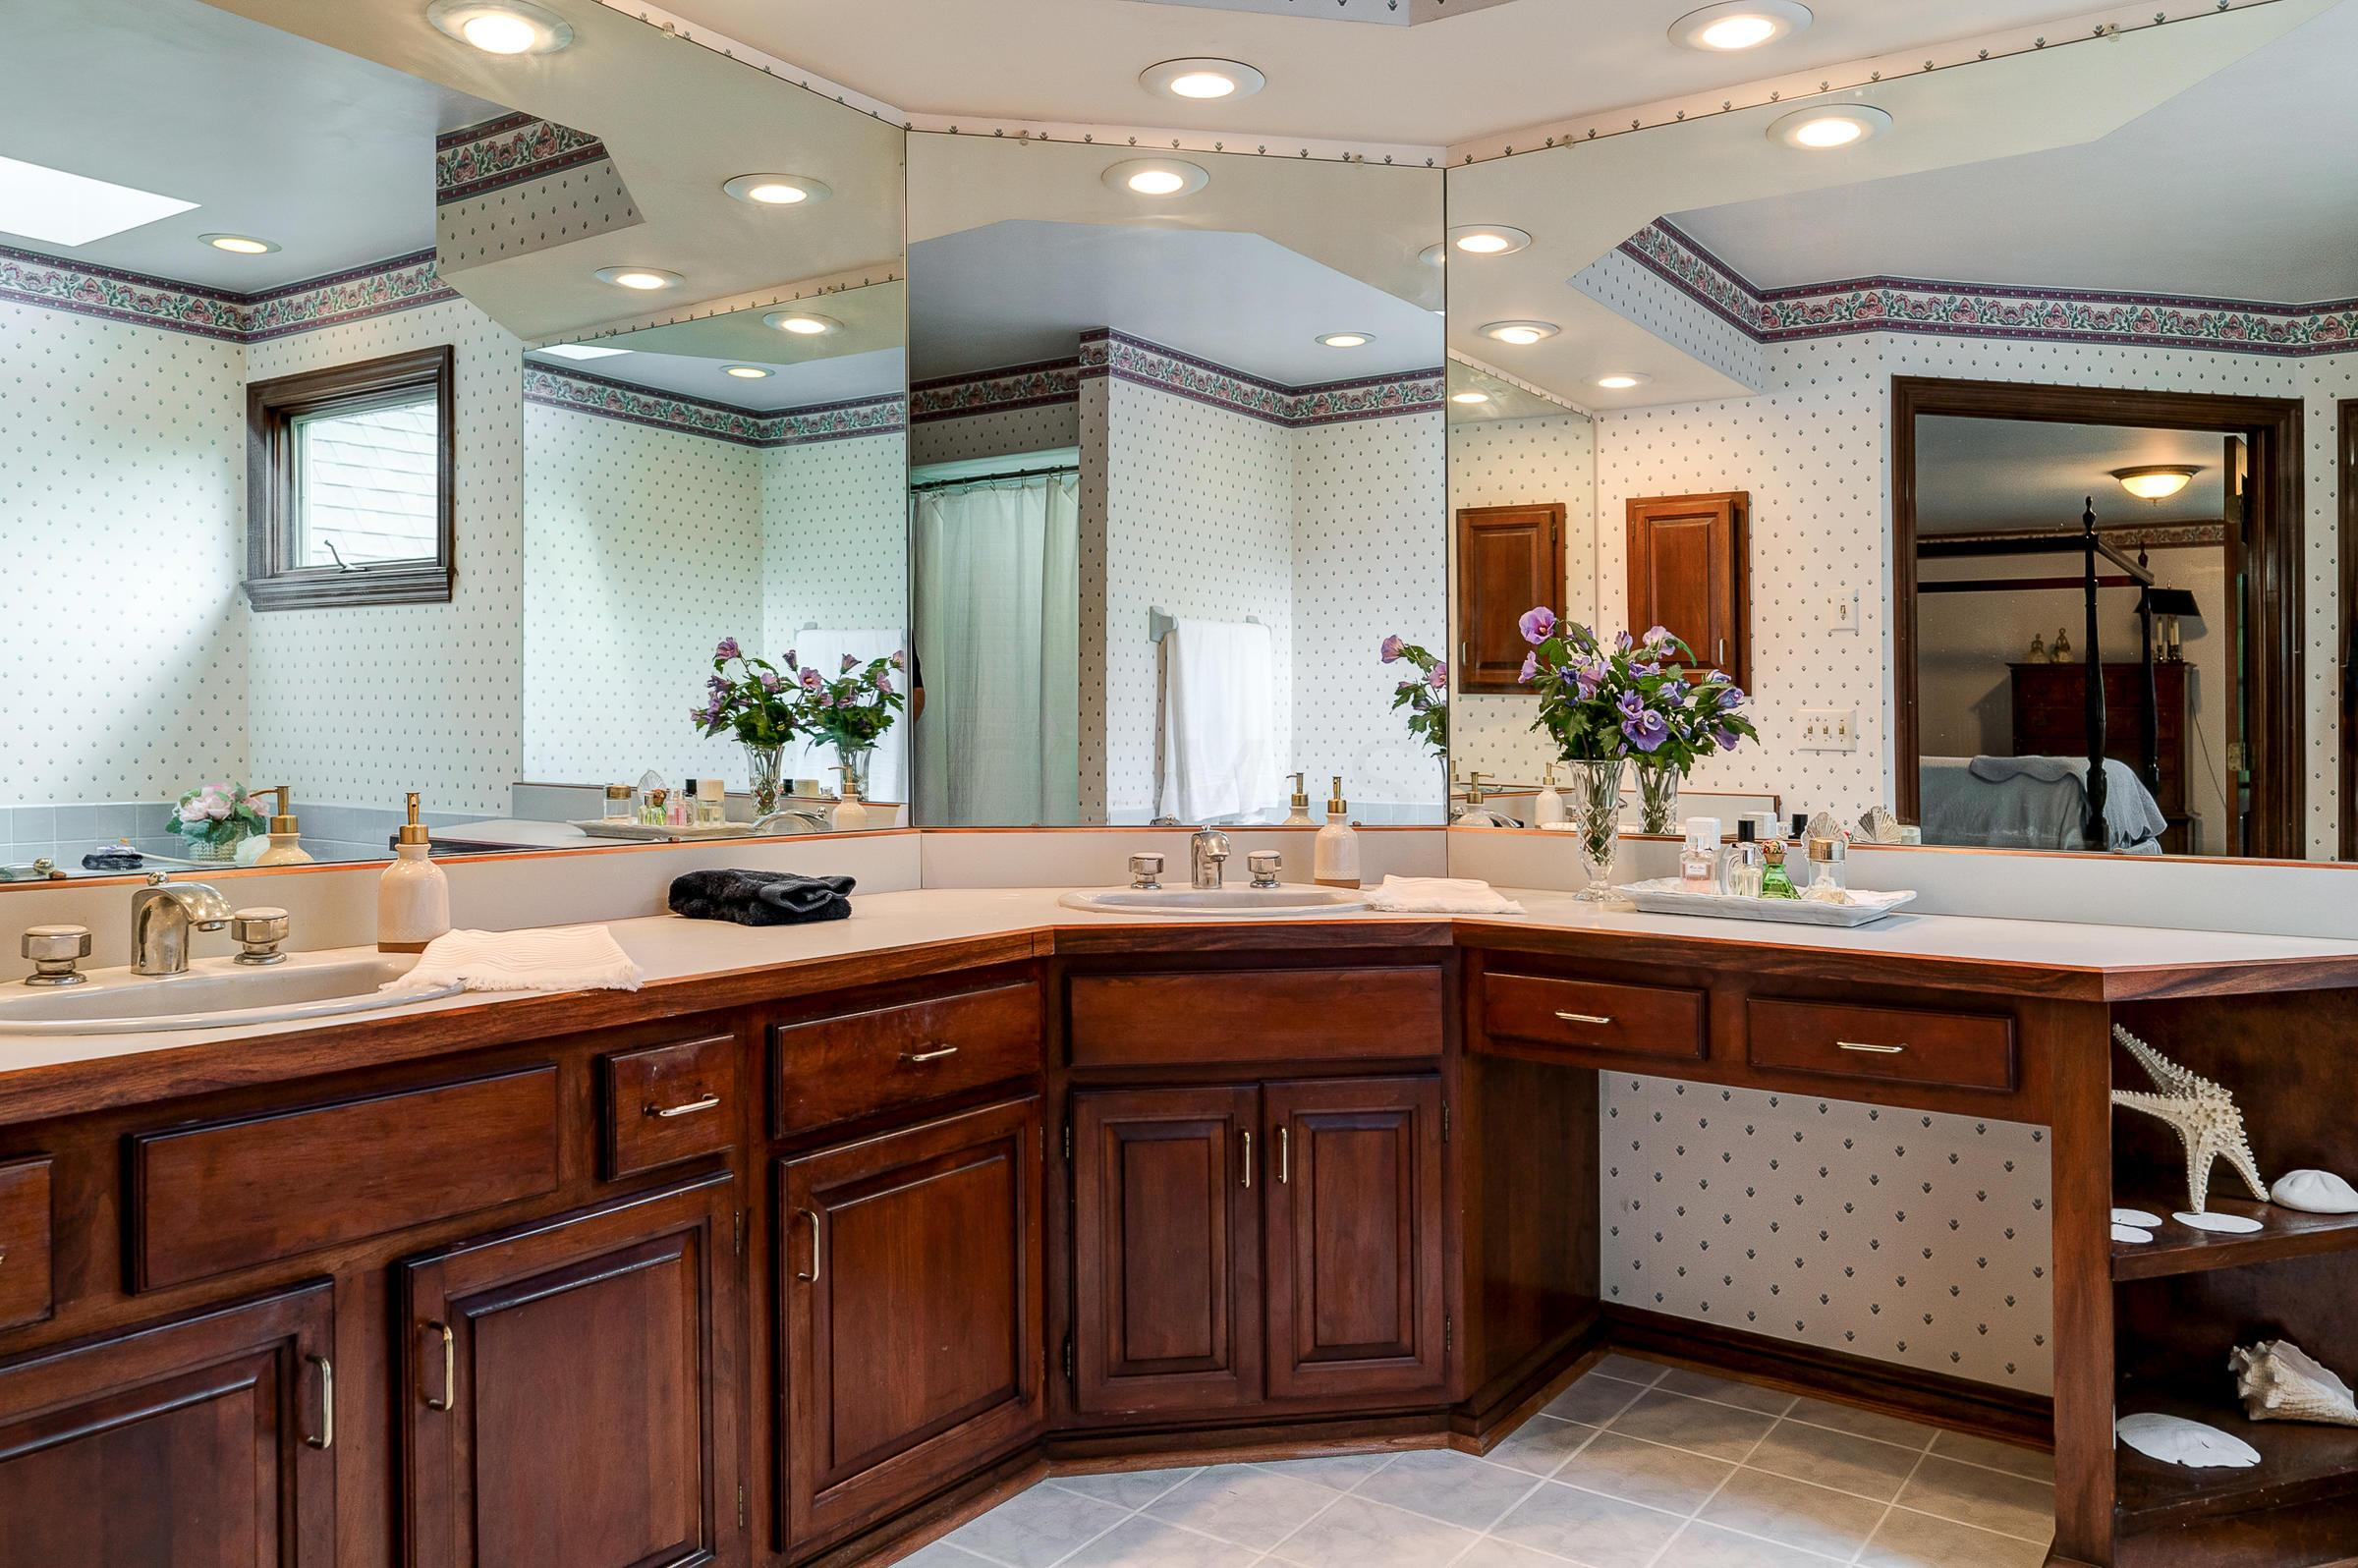 2249 Sedgwick Drive, Upper Arlington, Ohio 43220, 4 Bedrooms Bedrooms, ,4 BathroomsBathrooms,Residential,For Sale,Sedgwick,220016785